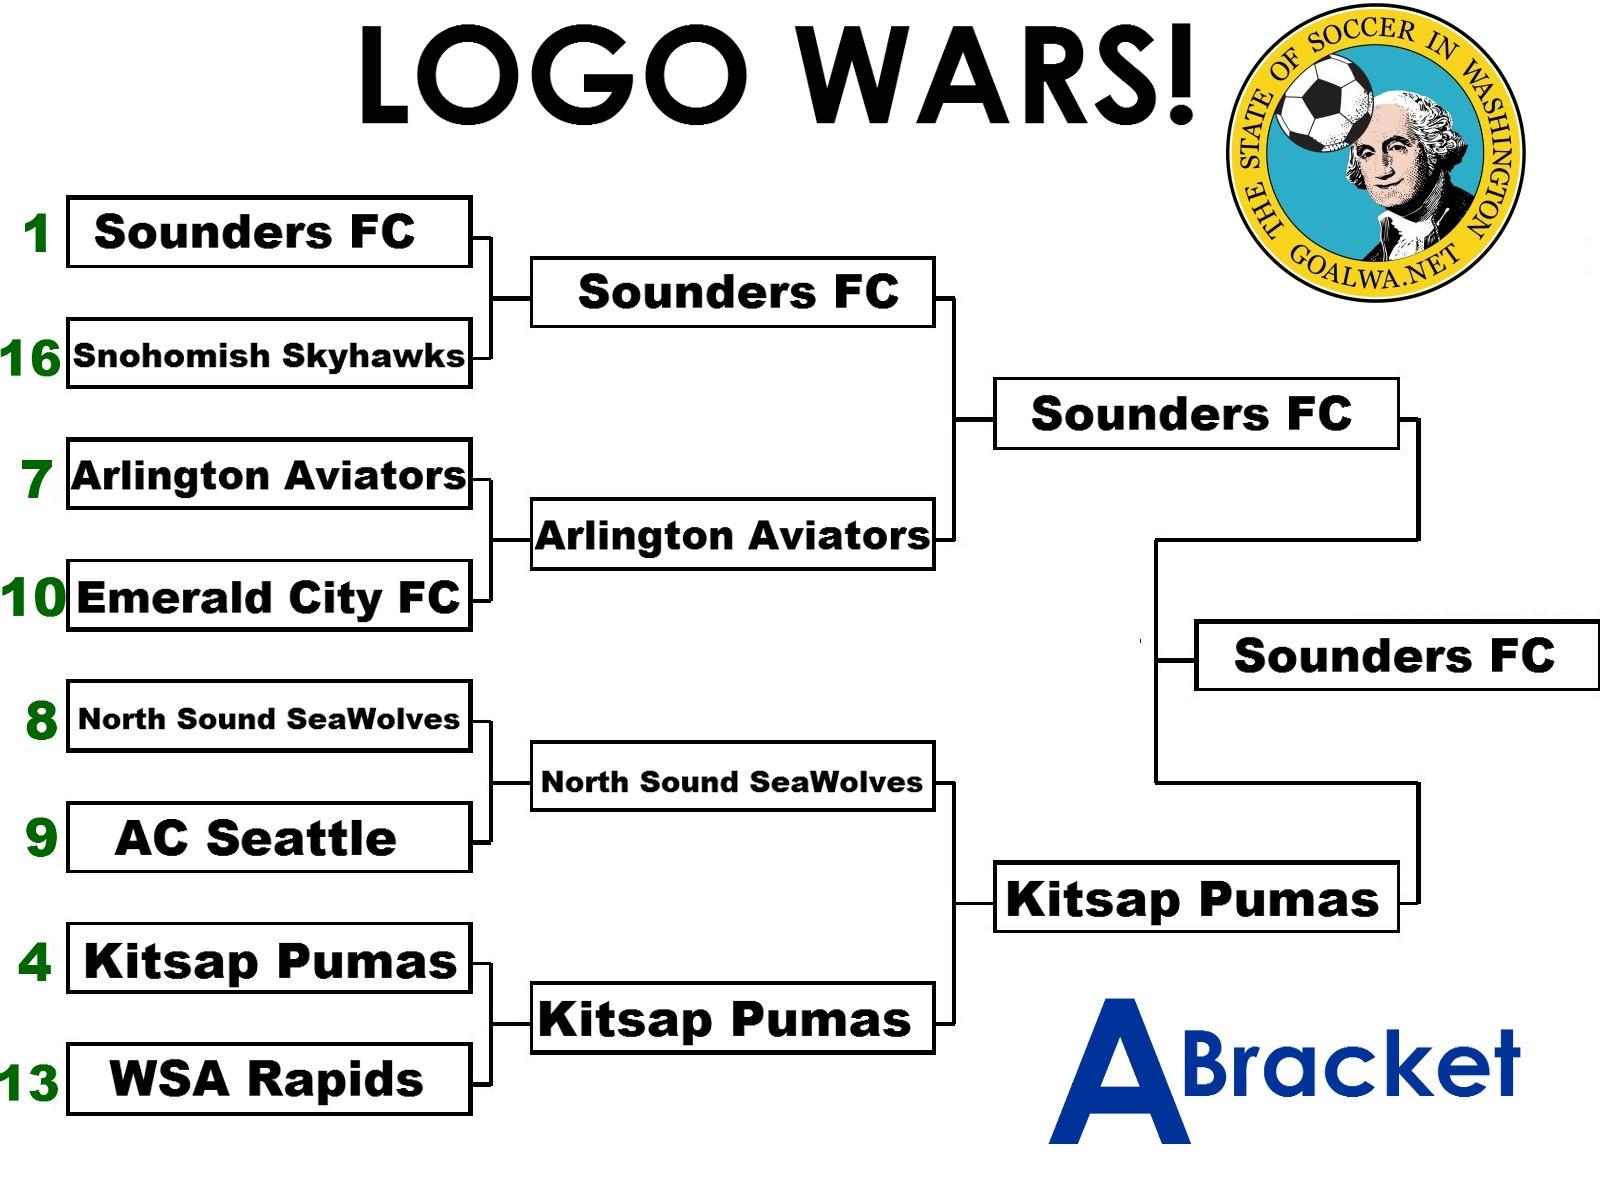 Logo Wars Final Sounders V Hammers Poll Now Open Goalwa Net Archive